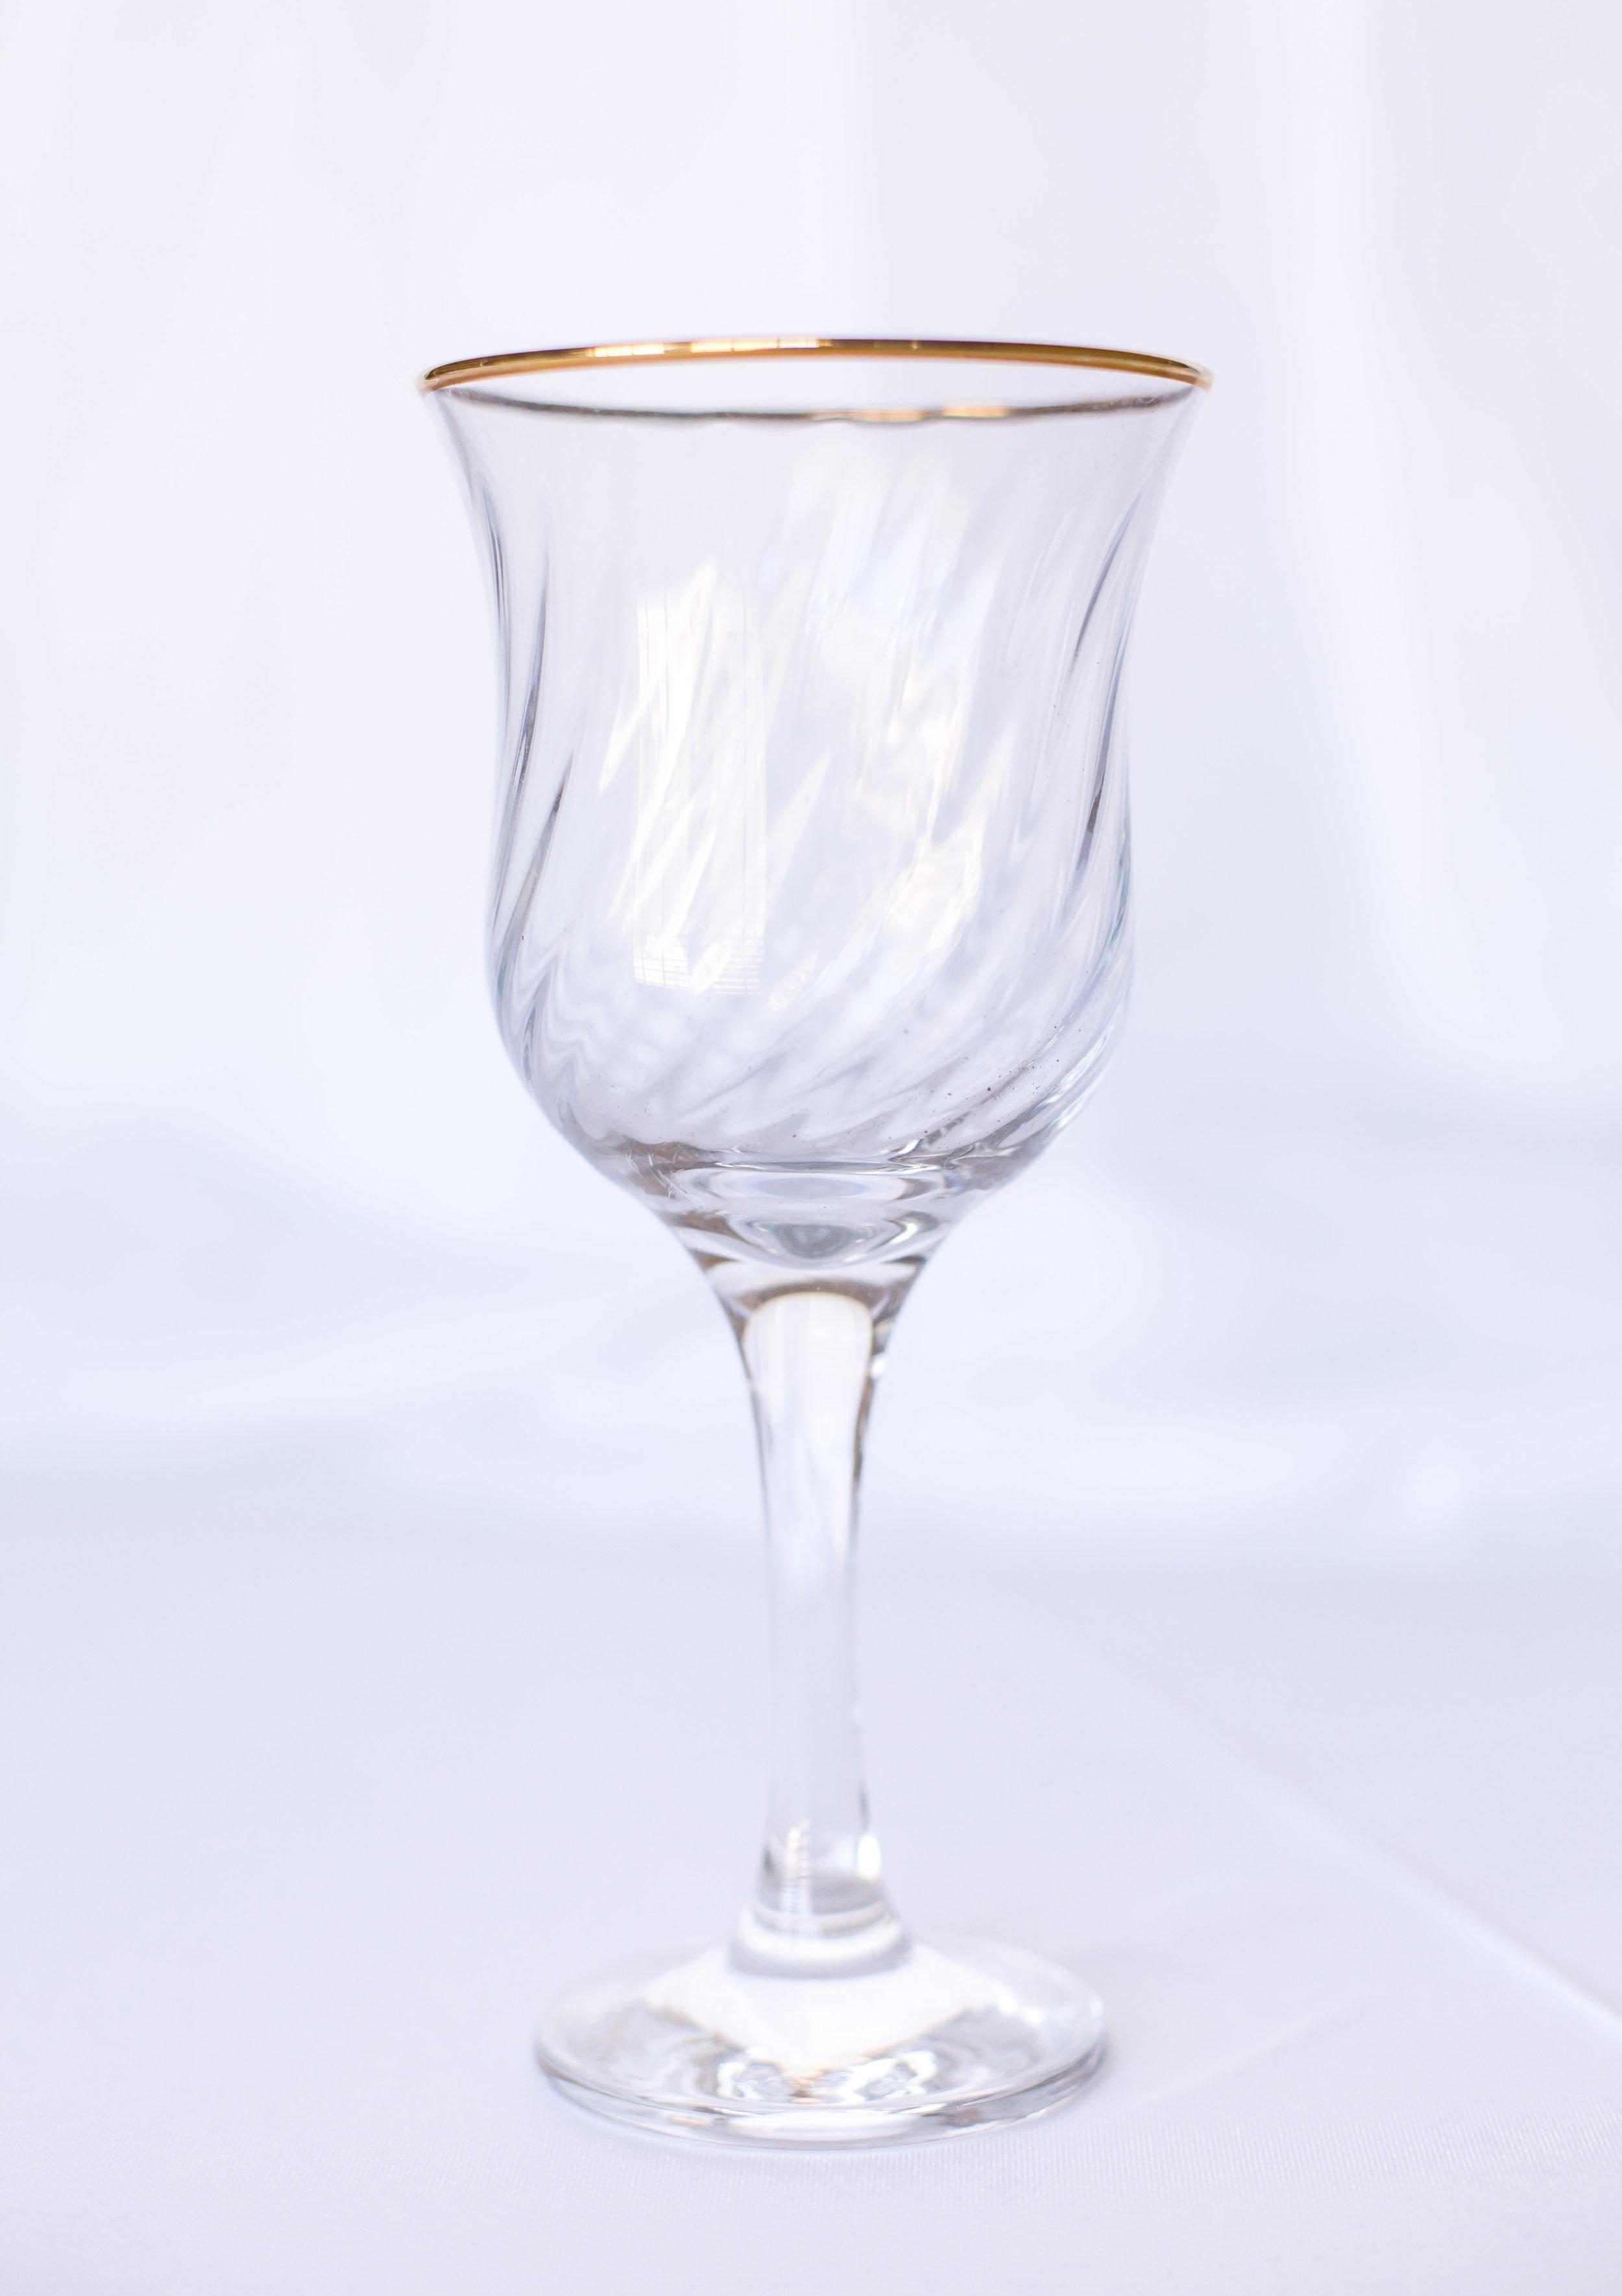 gold rim glass (tall).jpg